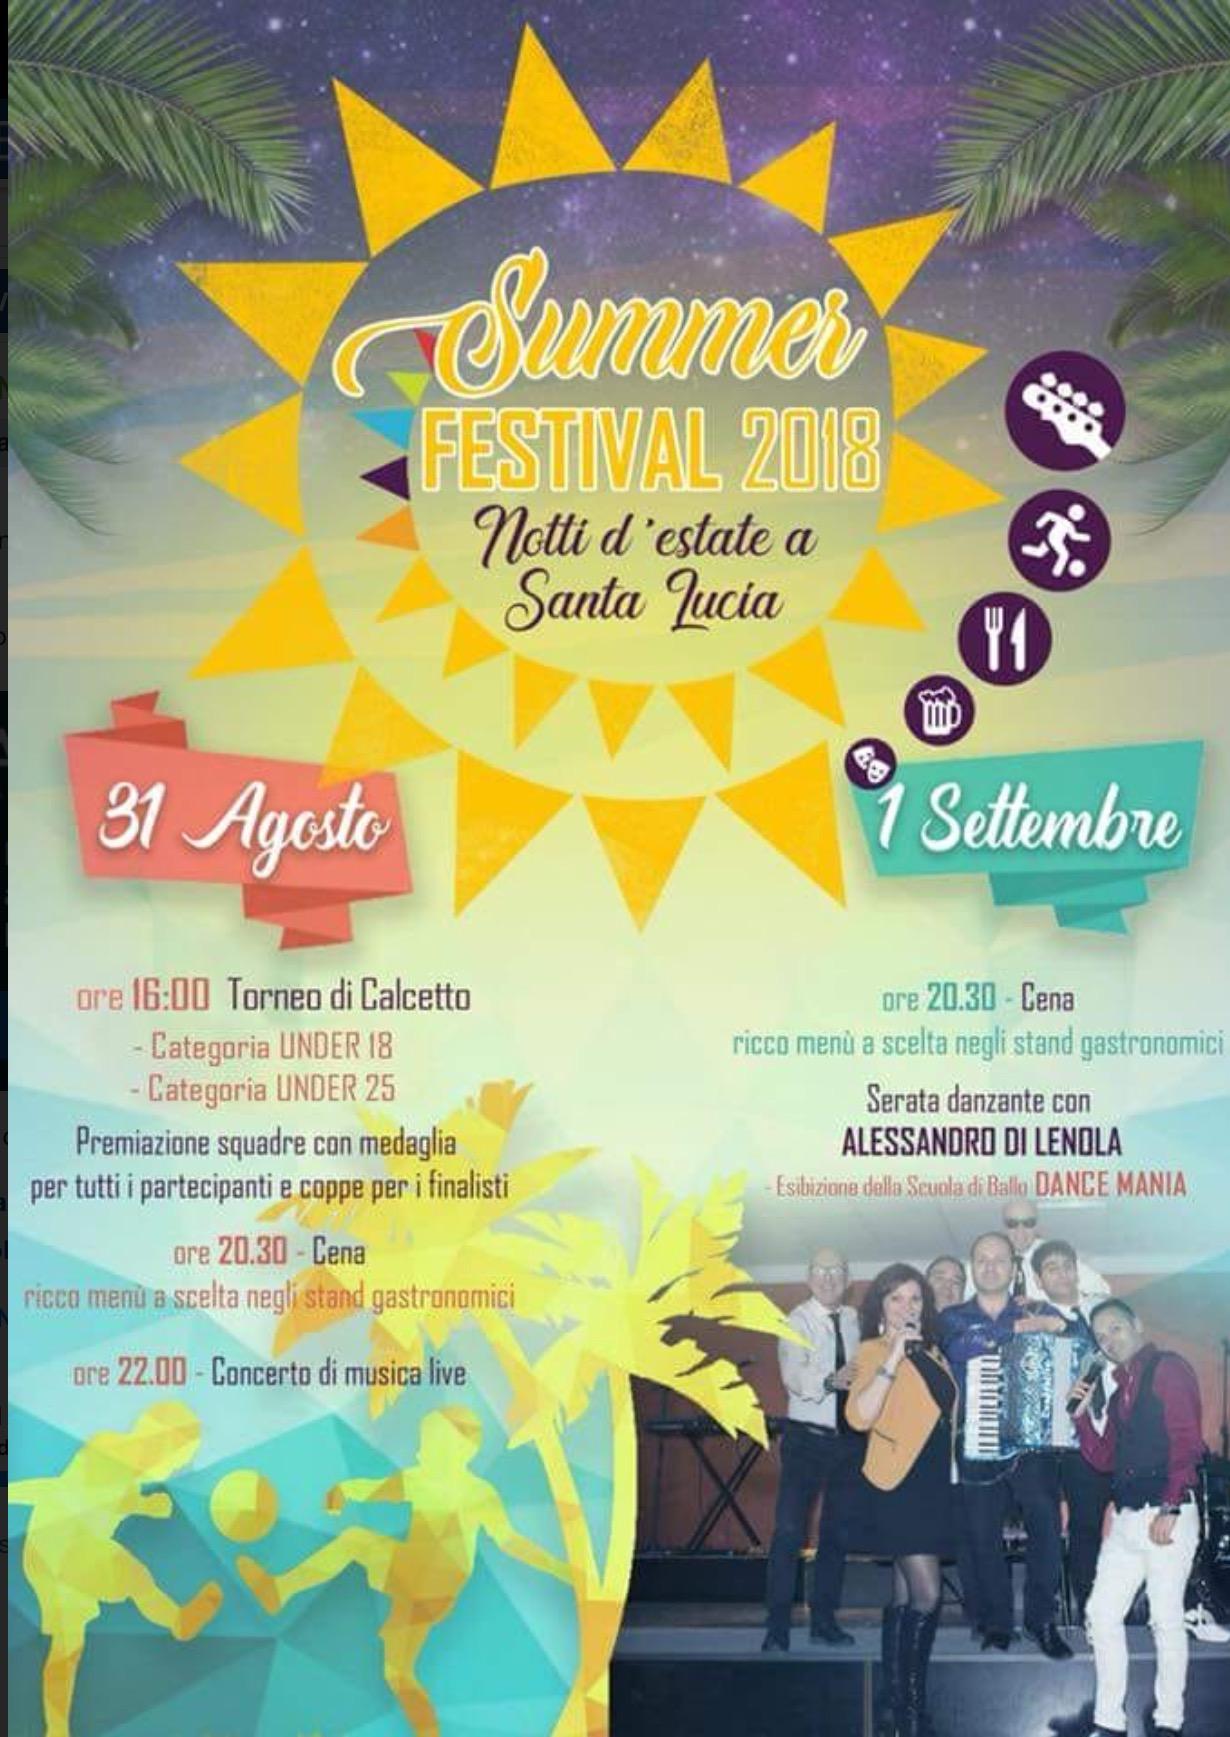 SUMMER FESTIVAL 2018: Notti d'estate a Santa Lucia,Sezze